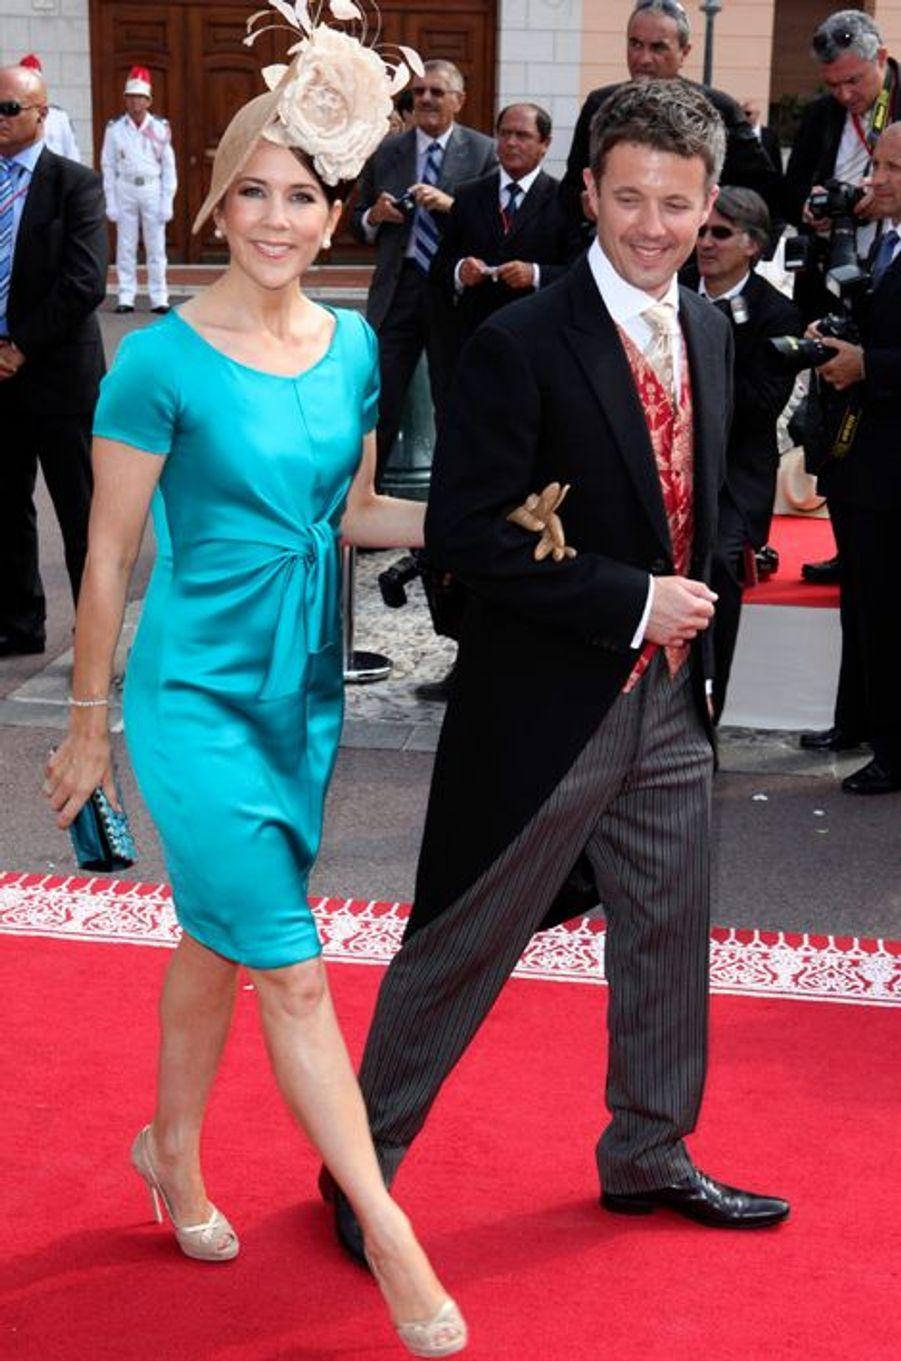 La princesse Mary de Danemark, le 2 juillet 2011